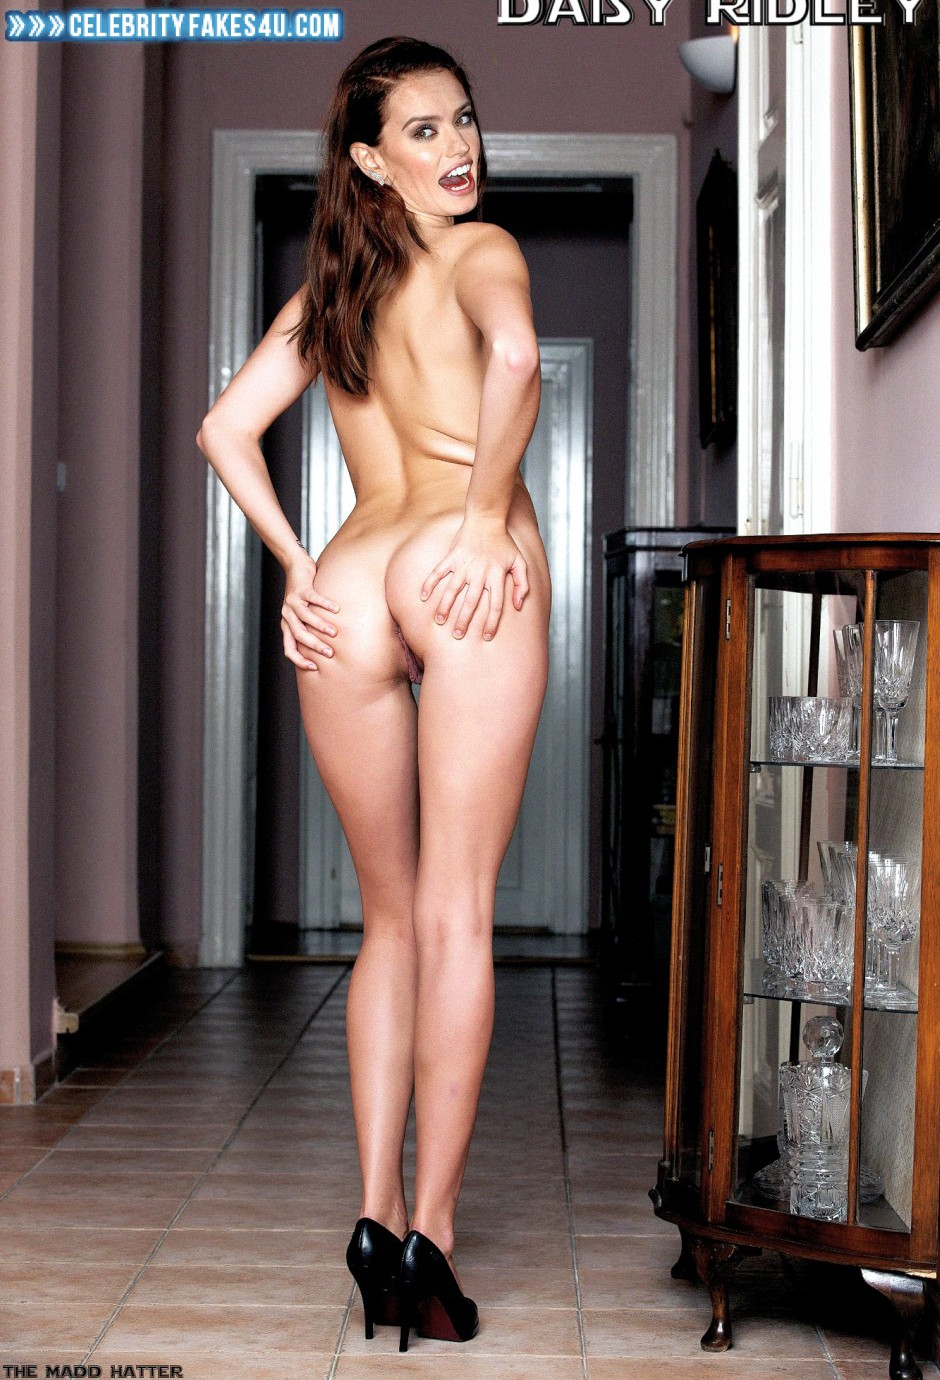 Daisy ridley nude fake